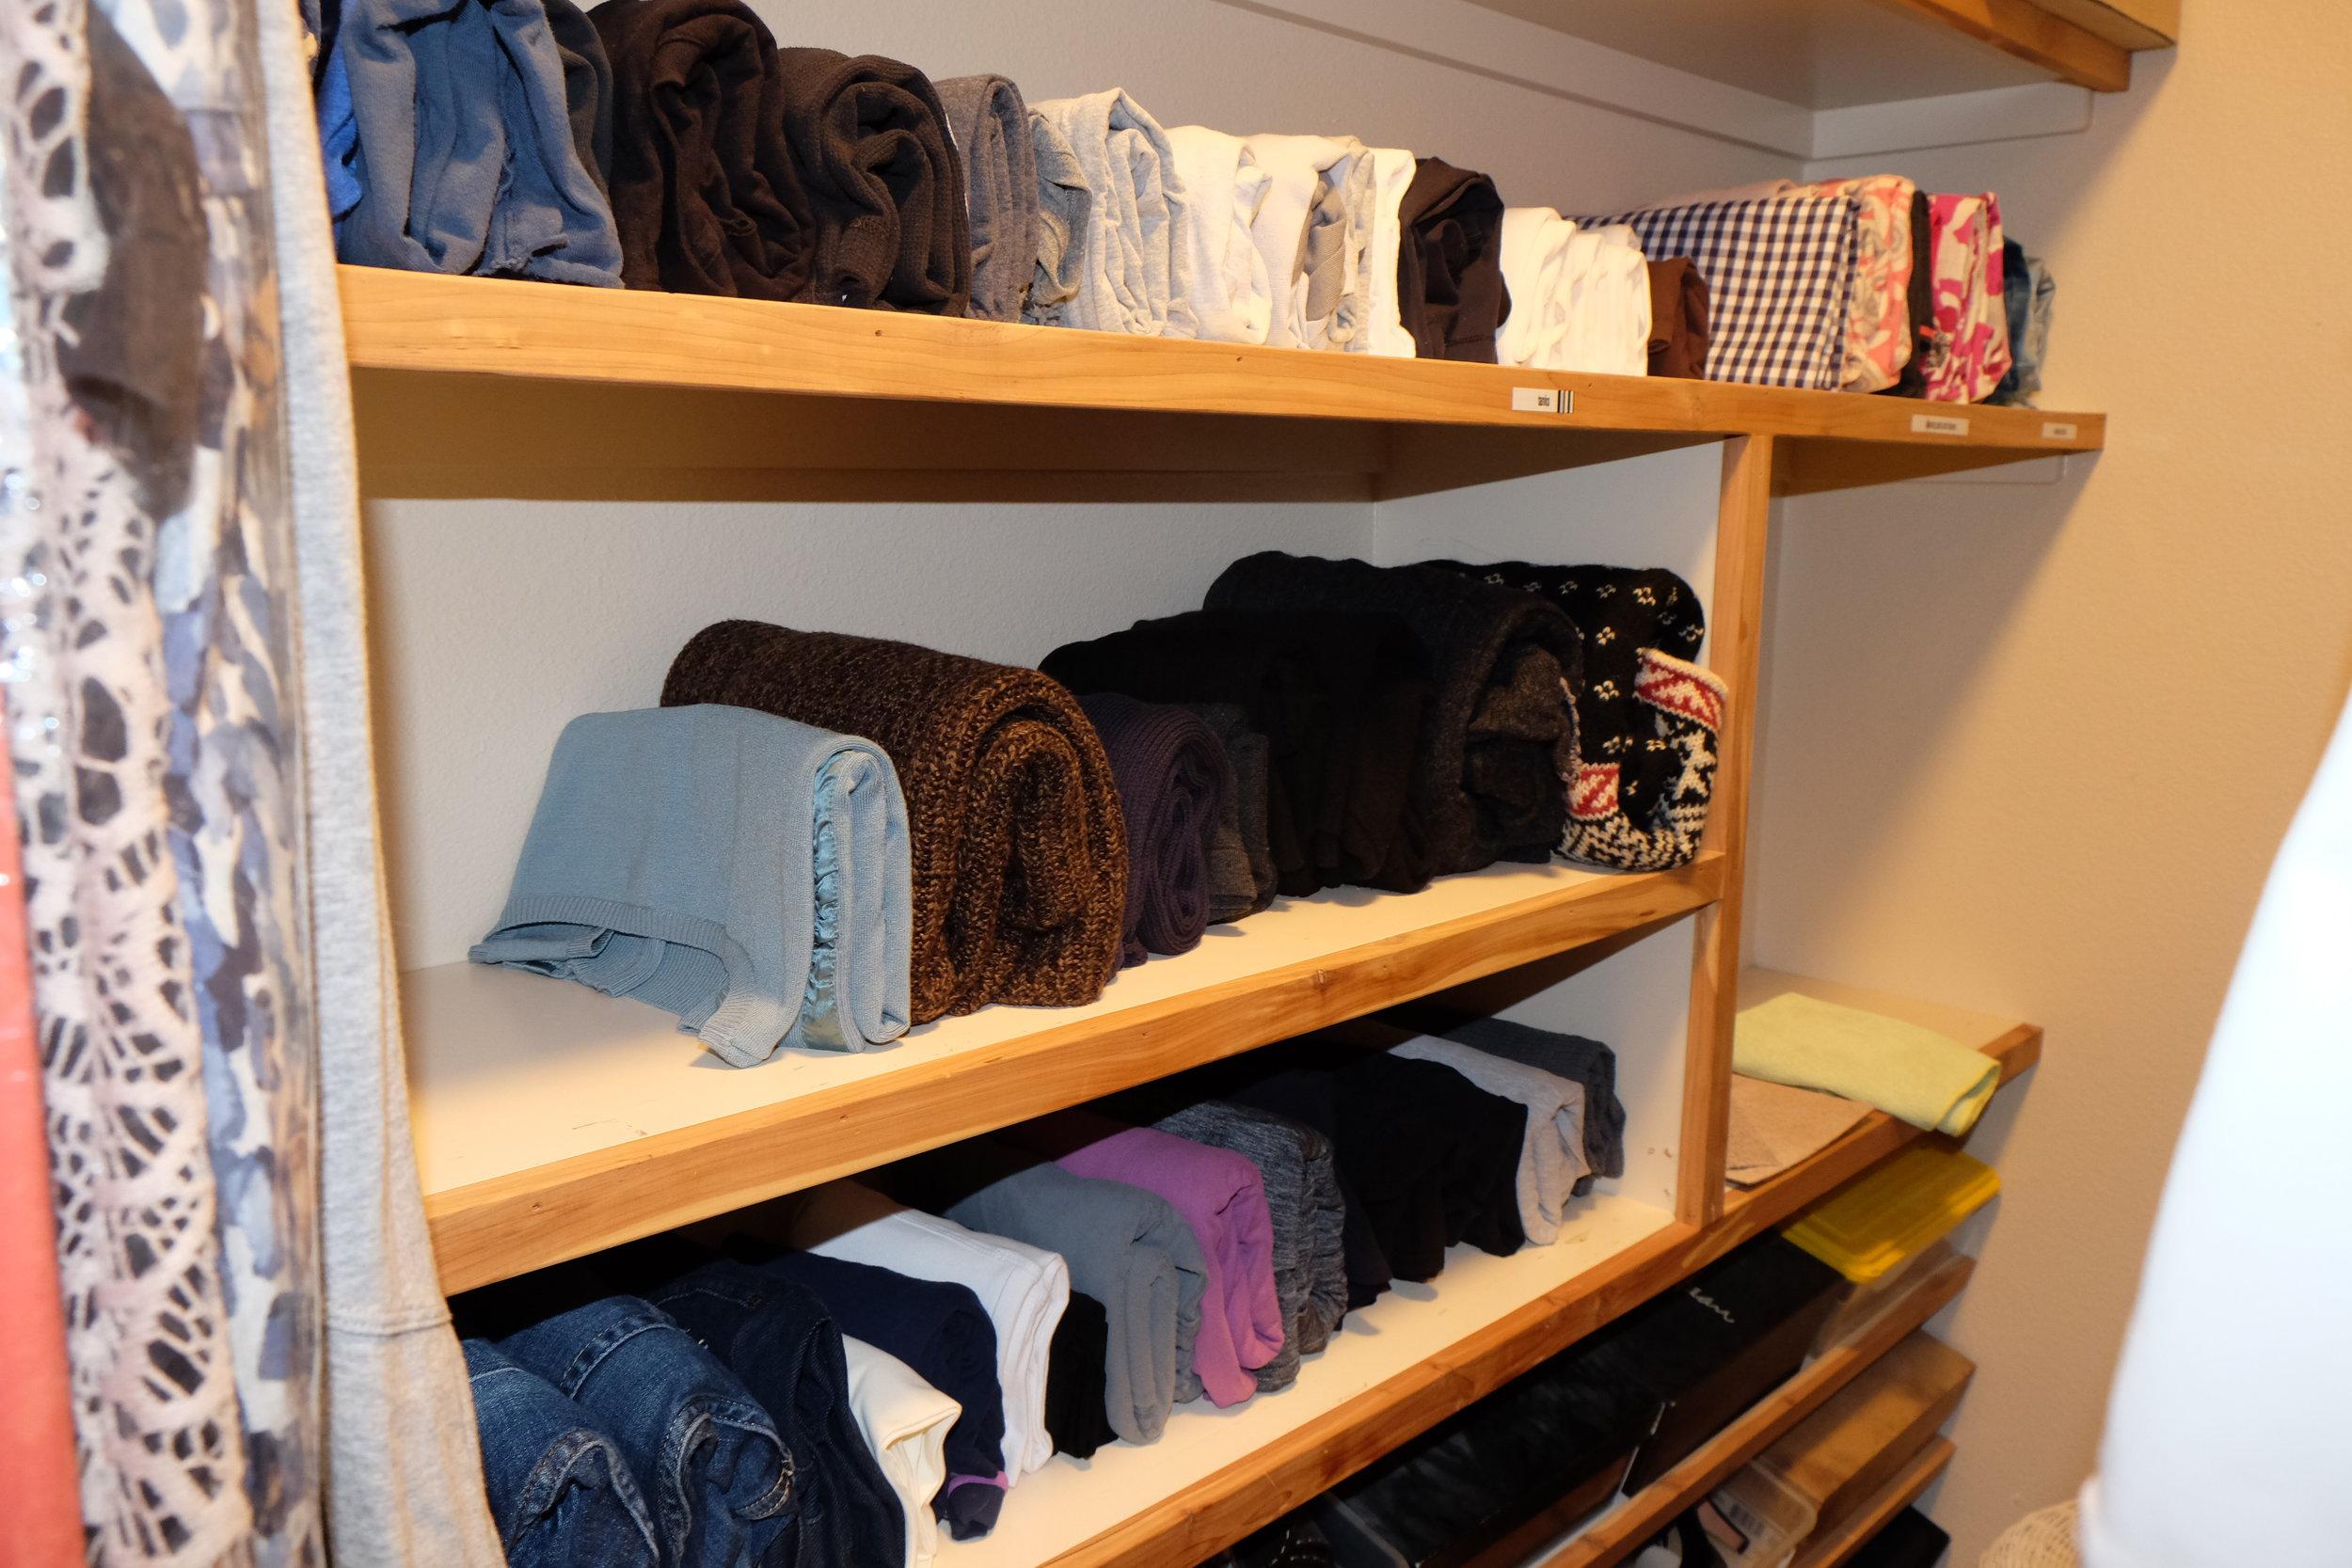 KonMari folding works on shelves as well as drawers